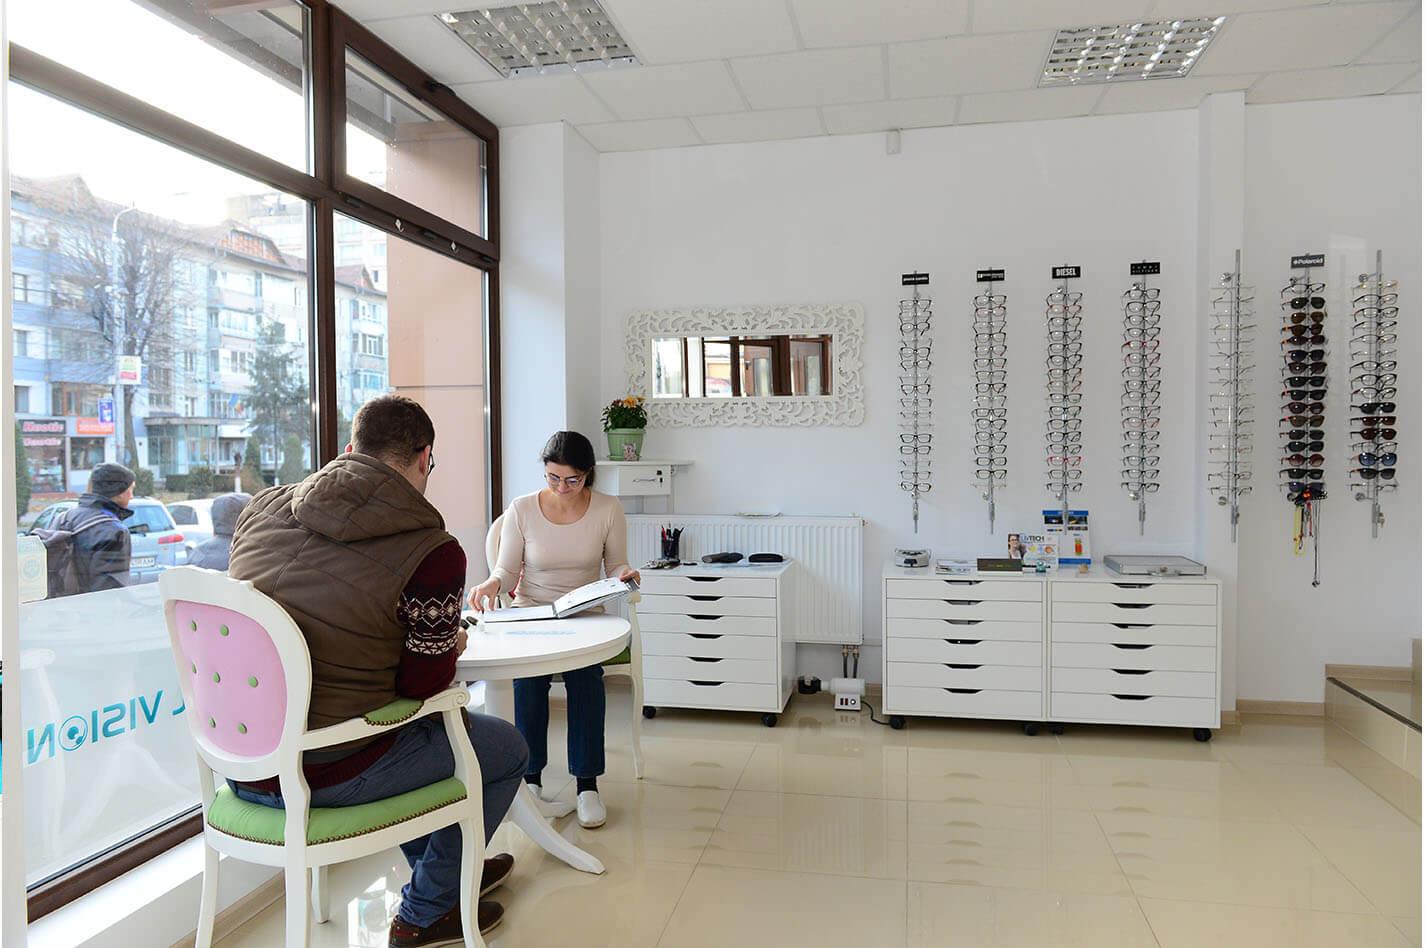 optica medicala cristal vision piatra neamt (4)